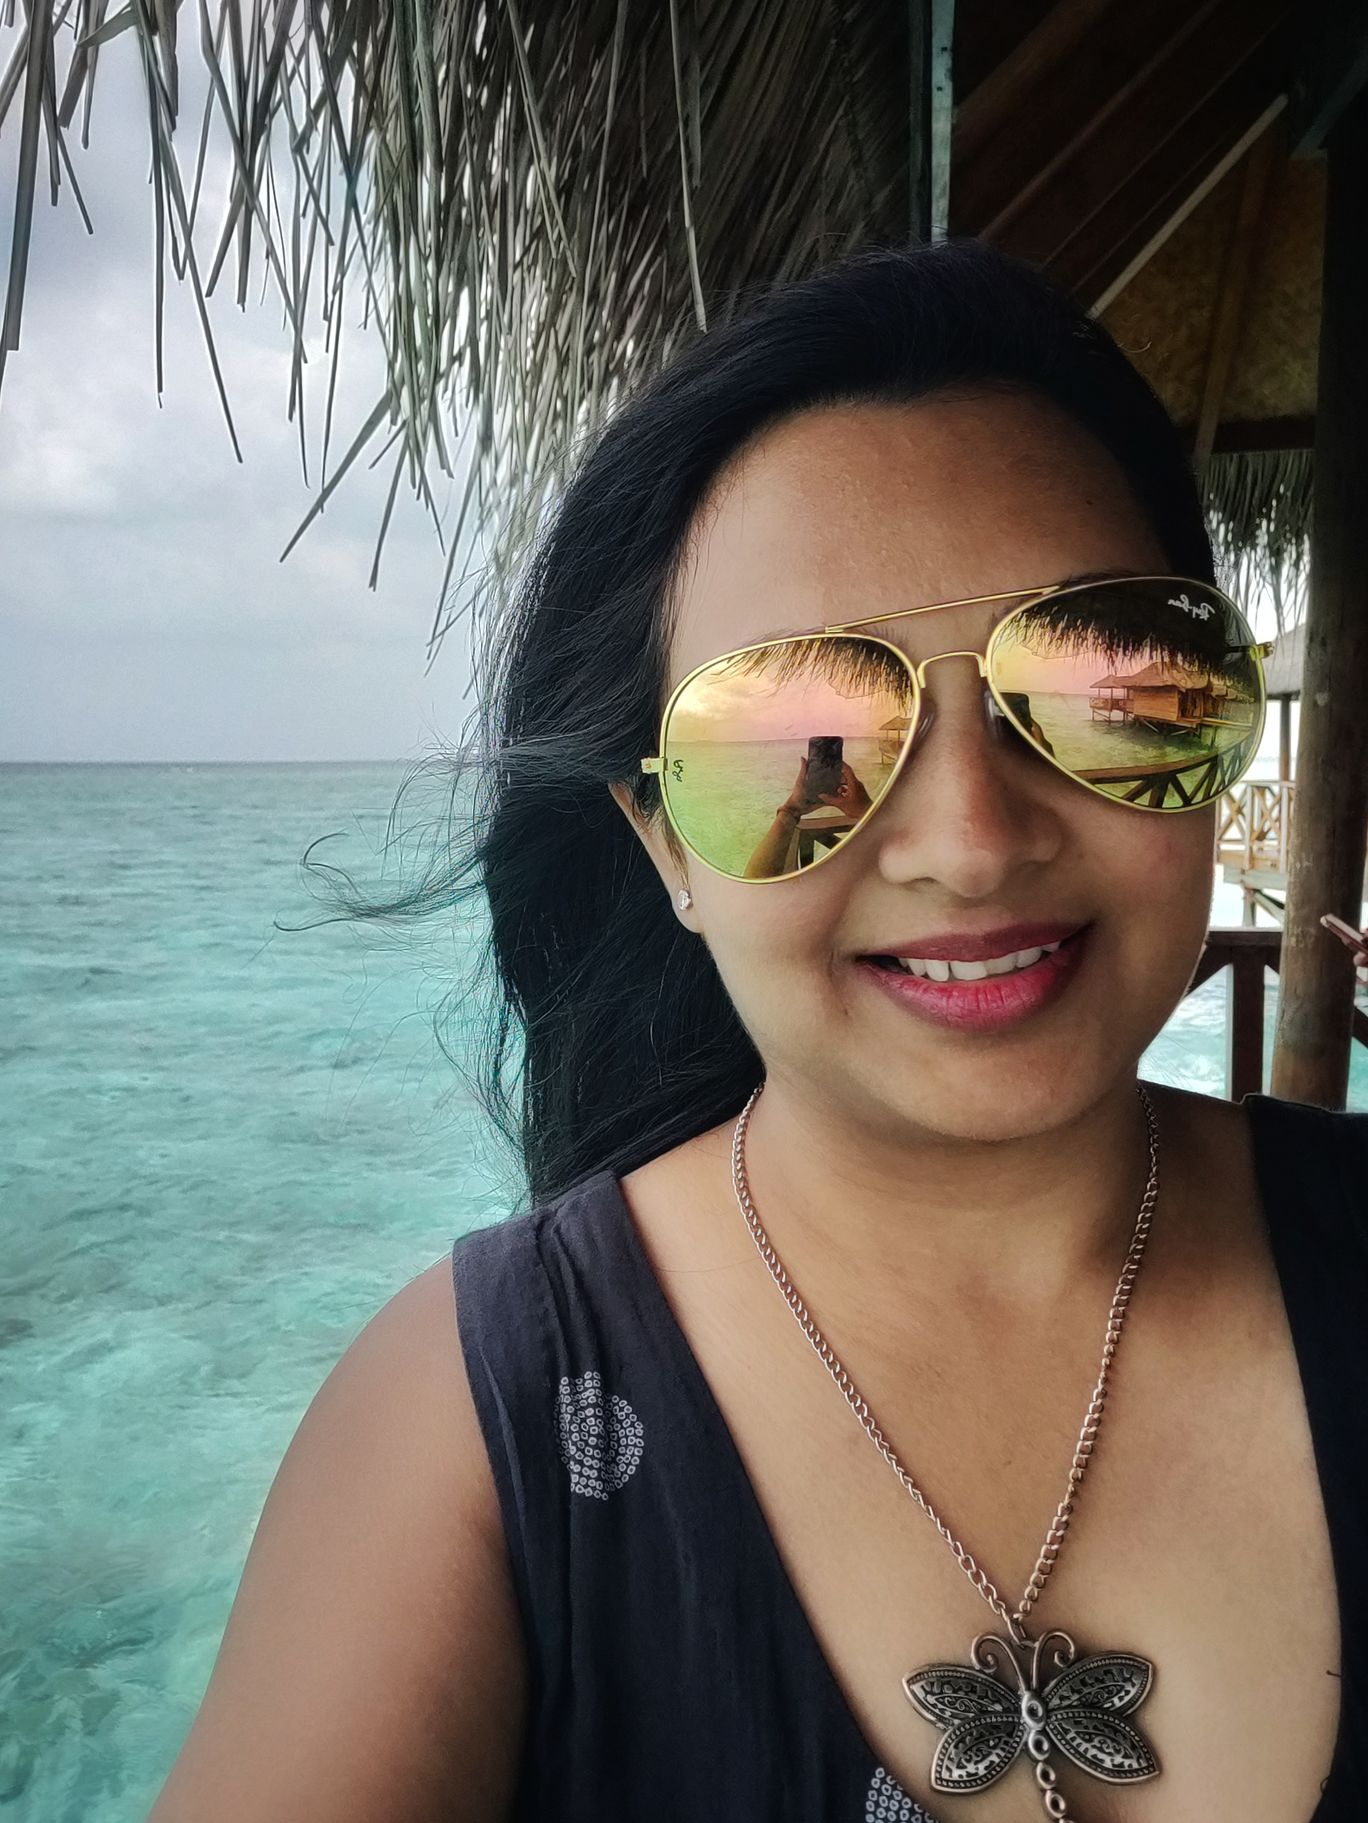 Photo of Maldive Islands By 1TeaspoonLove ®